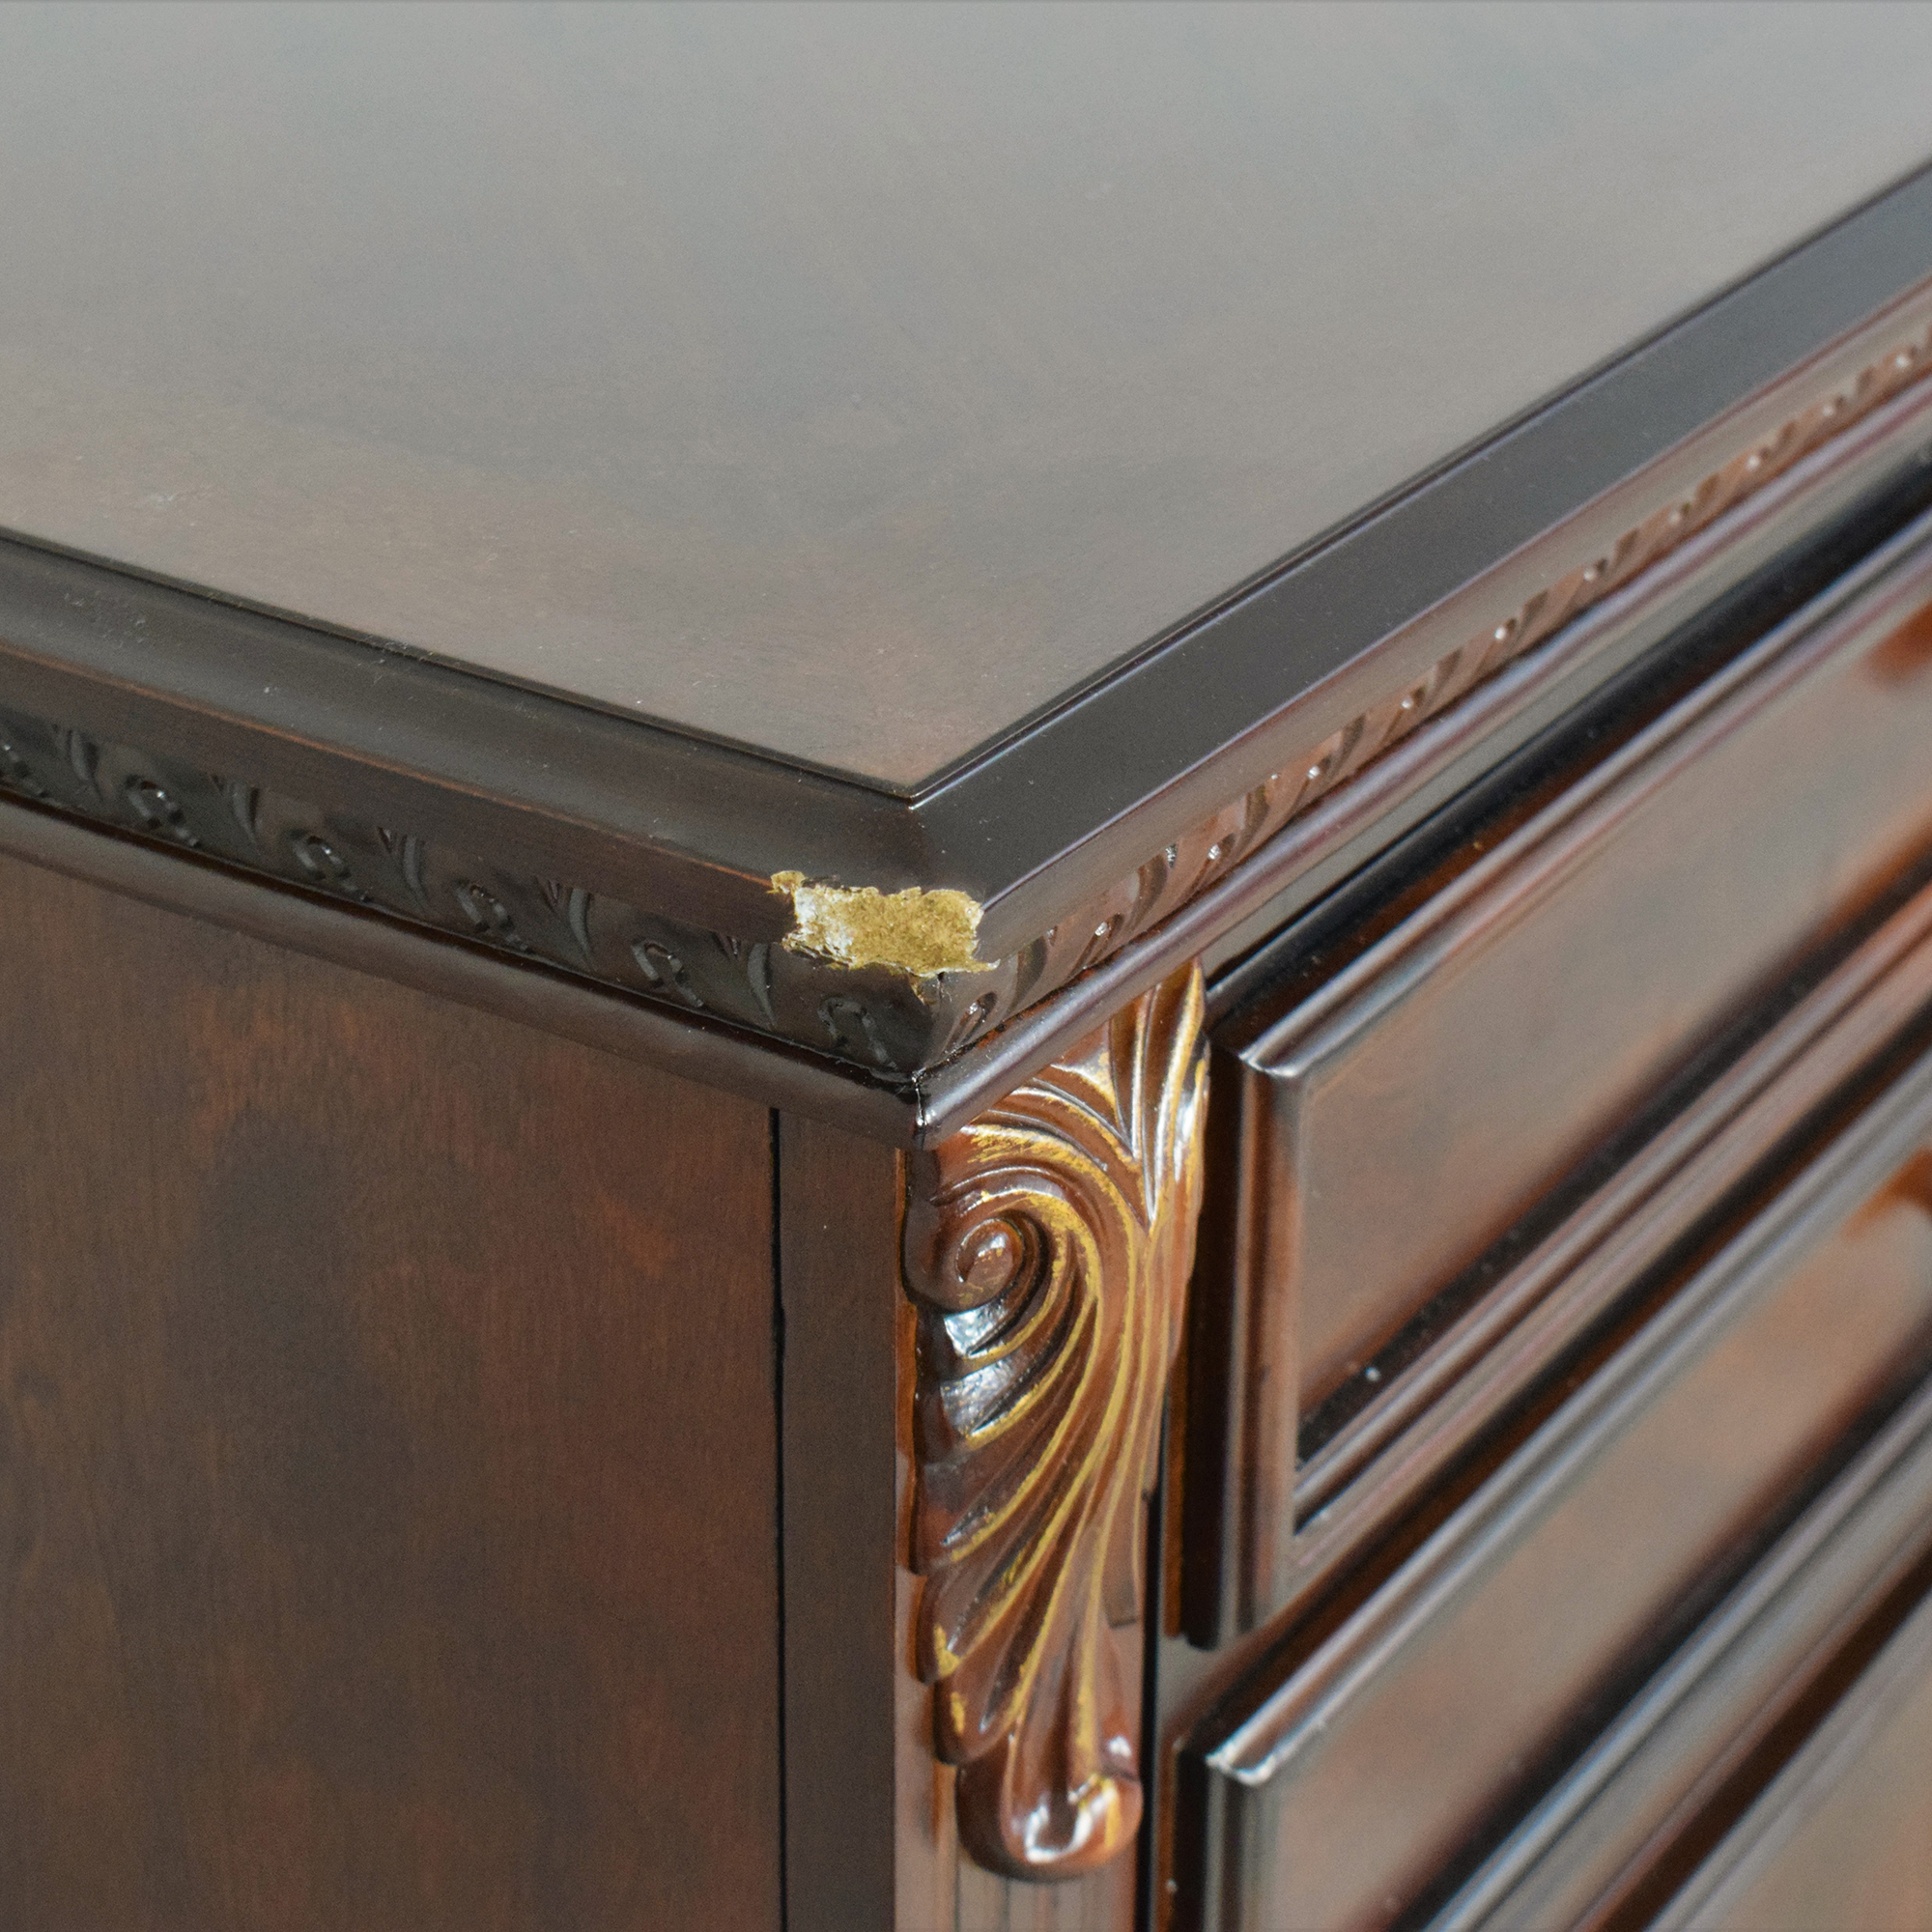 Ashley Furniture Ashley Furniture Leahlyn Buffet Cabinets & Sideboards